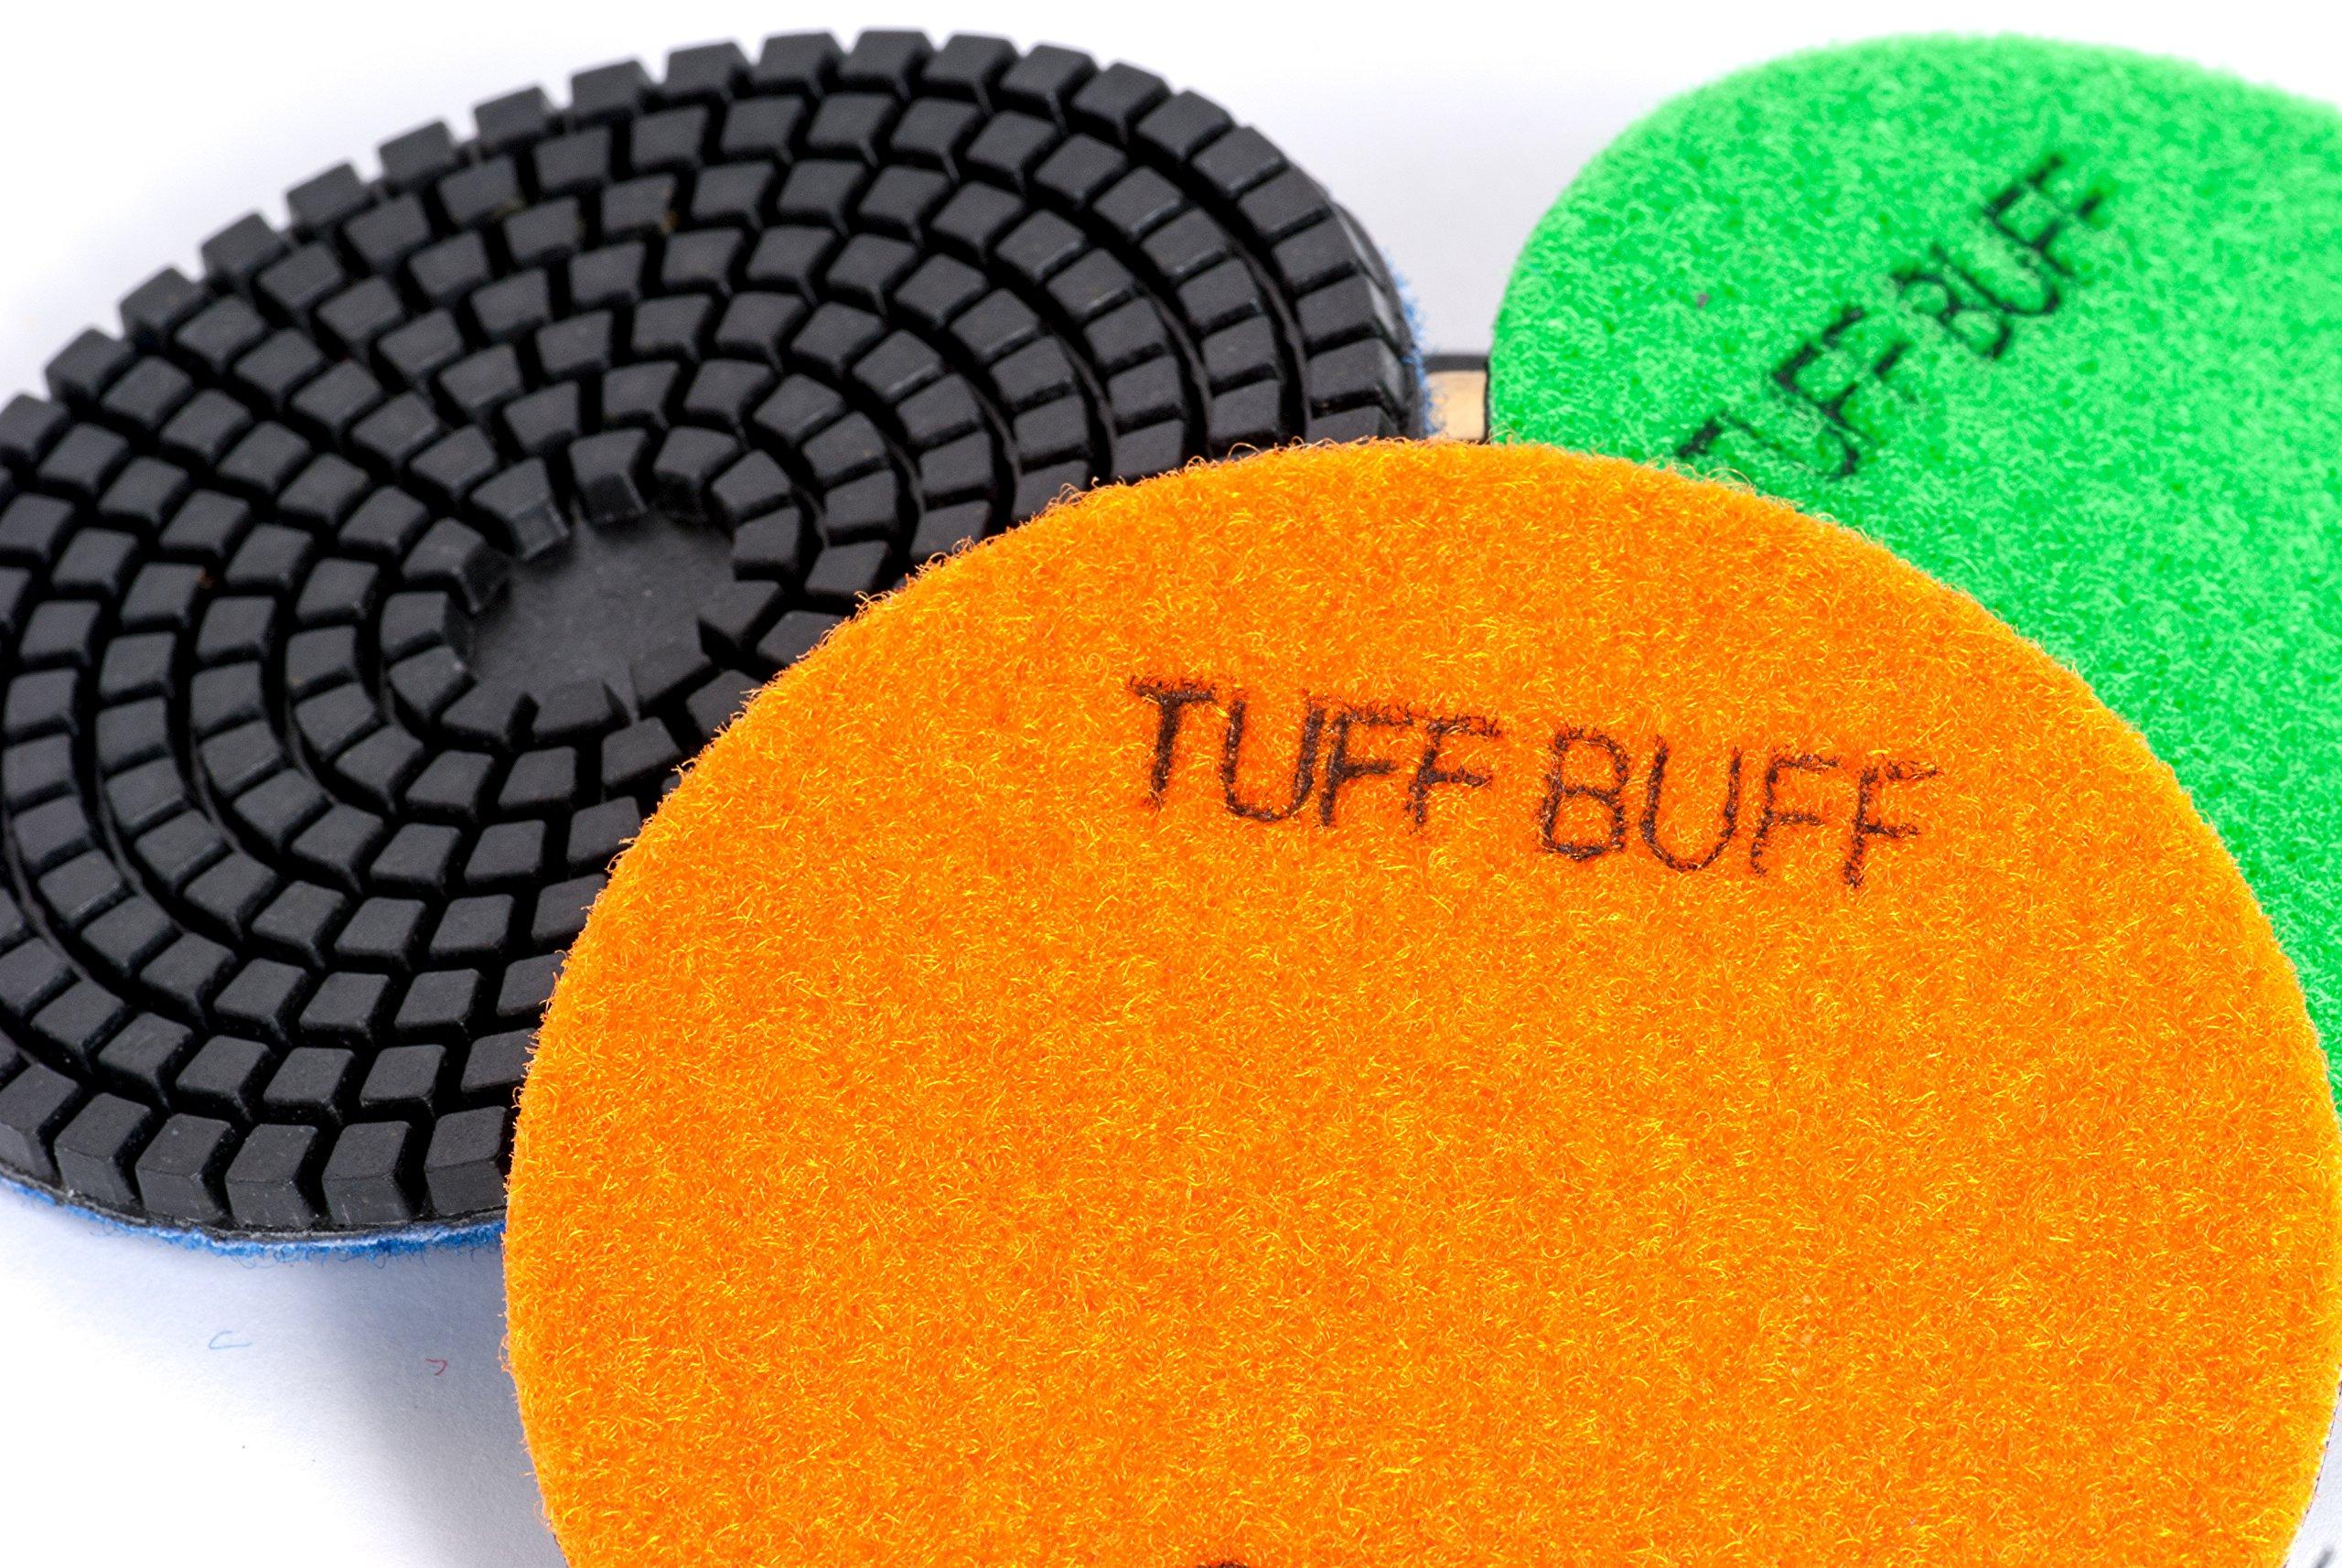 TUFF BUFF - Wet/Dry Diamond Polishing Pads - 11 Piece Set with Rubber Backer for Granite, Stone, Concrete, Marble, Travertine, Terrazzo- 4'' Inch Pads by Tuff Buff (Image #3)